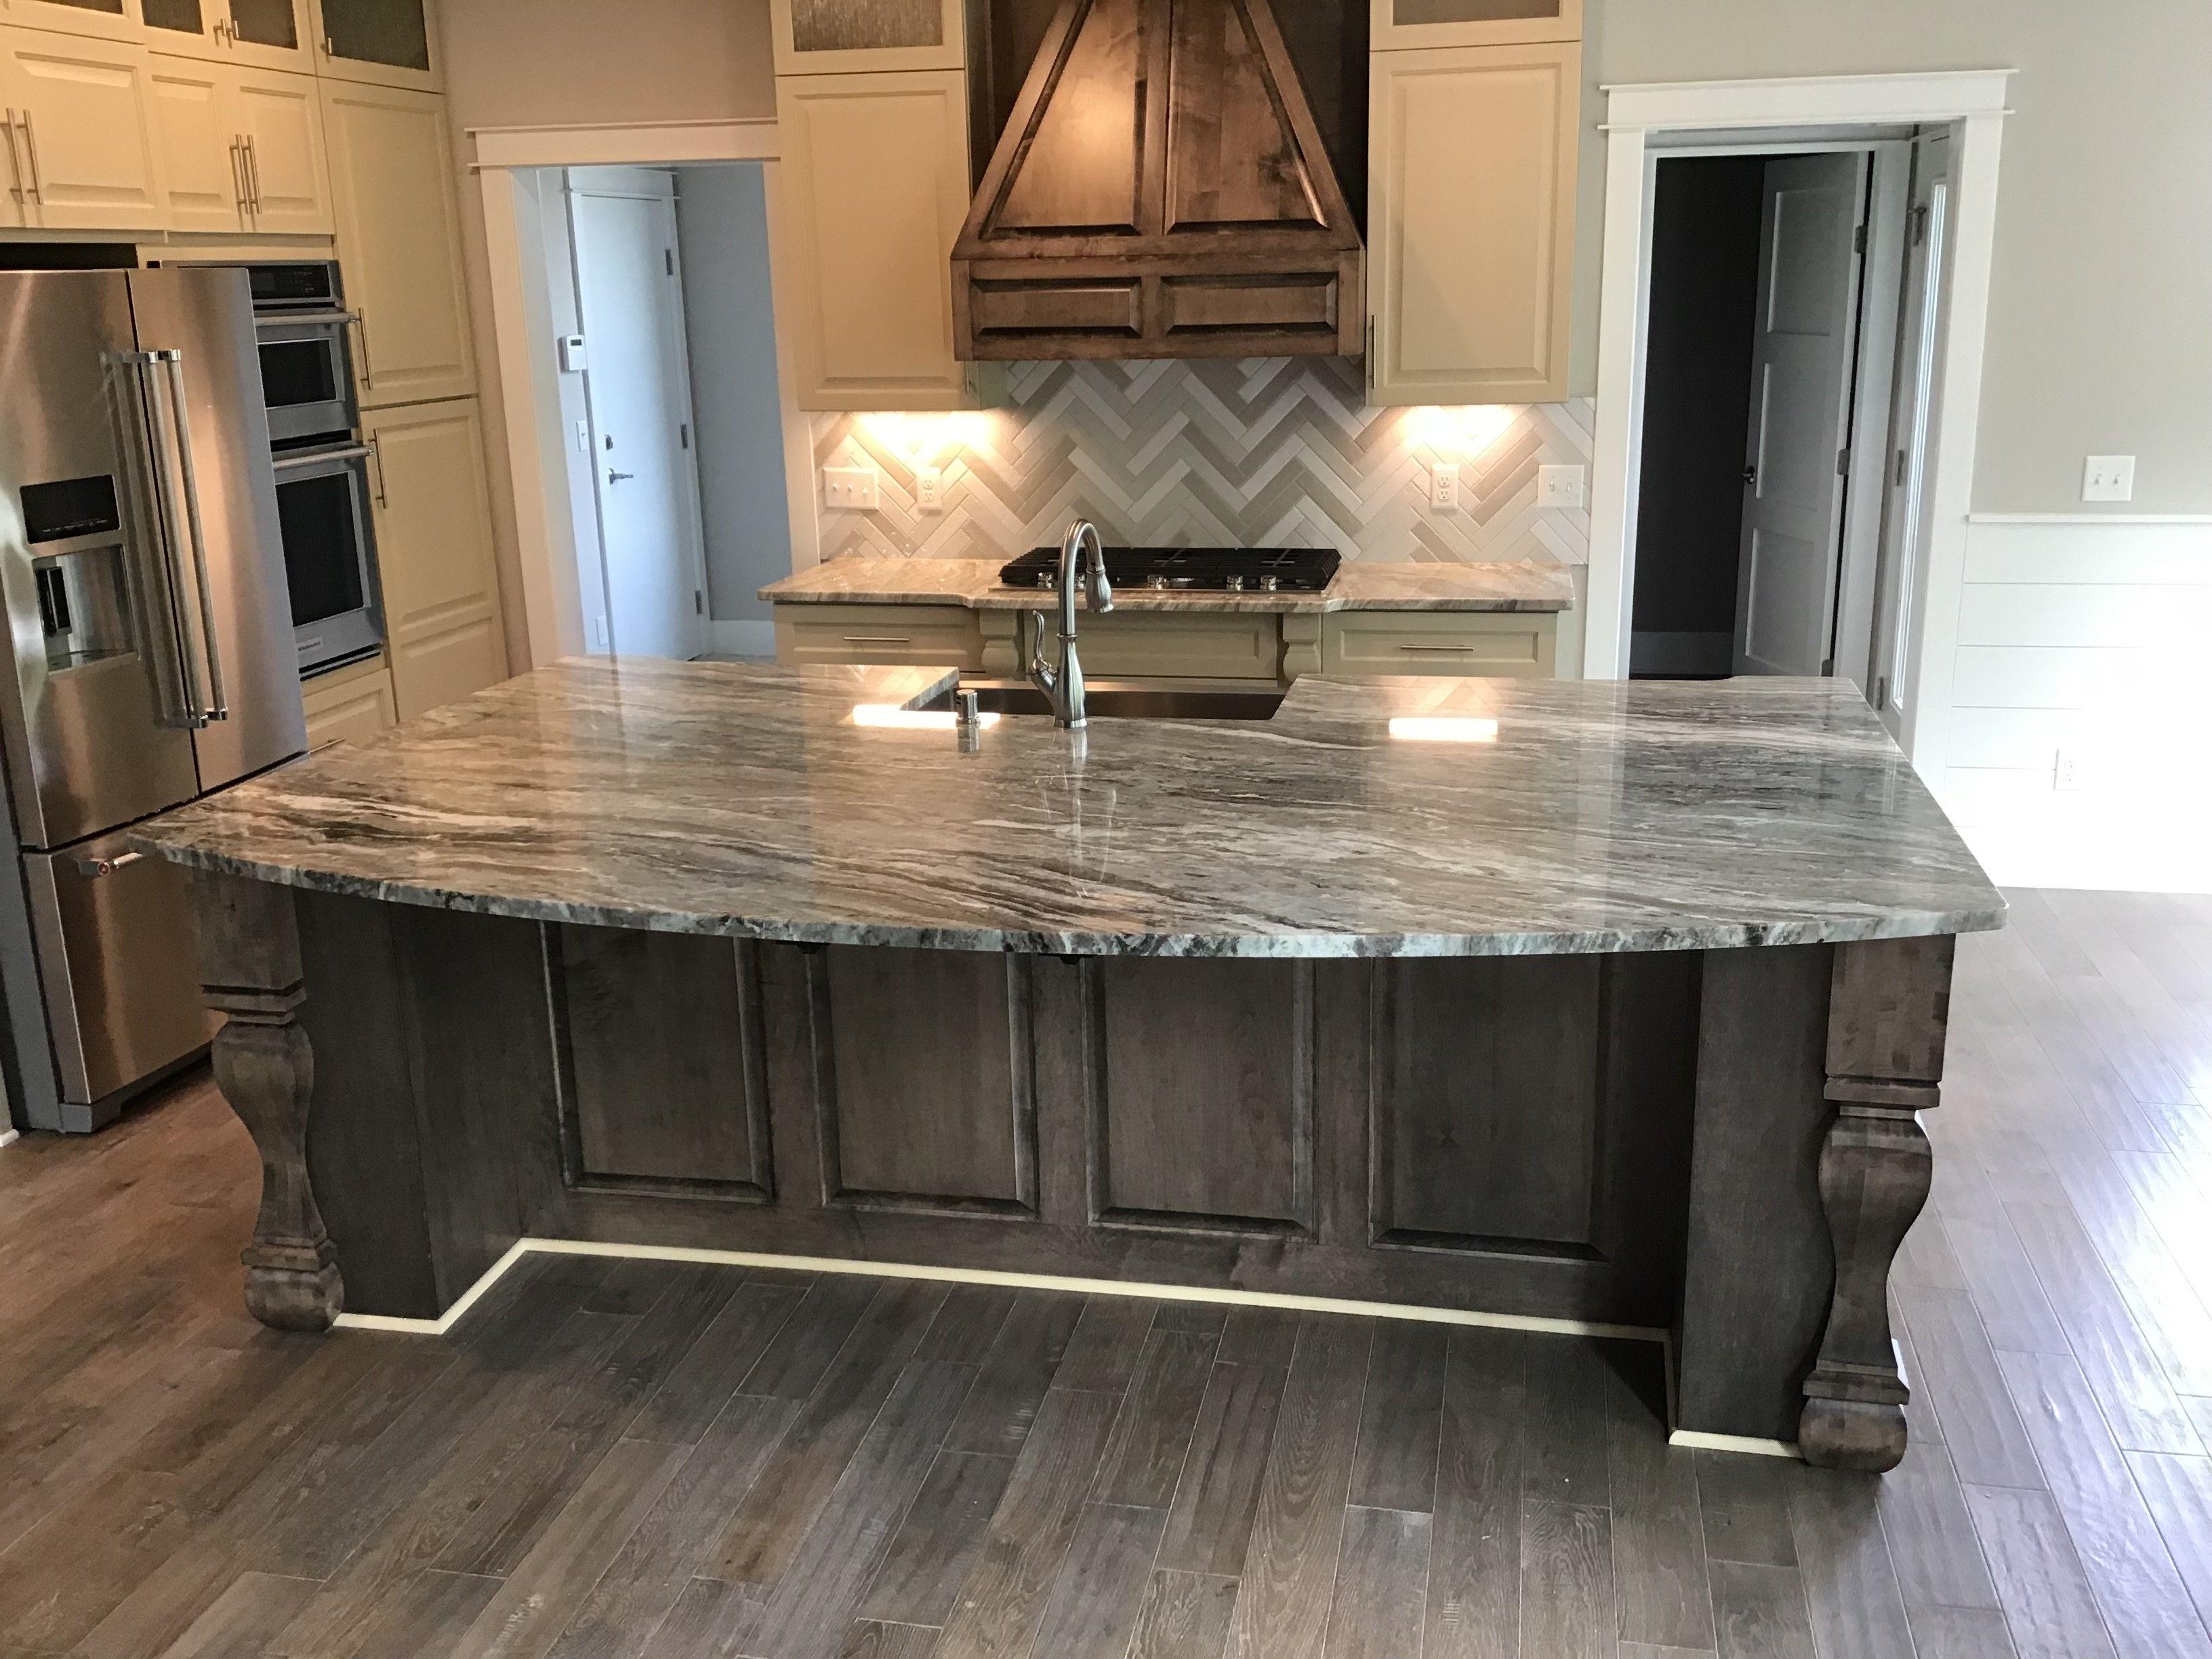 countertops - granite & quartz - our process | countertops